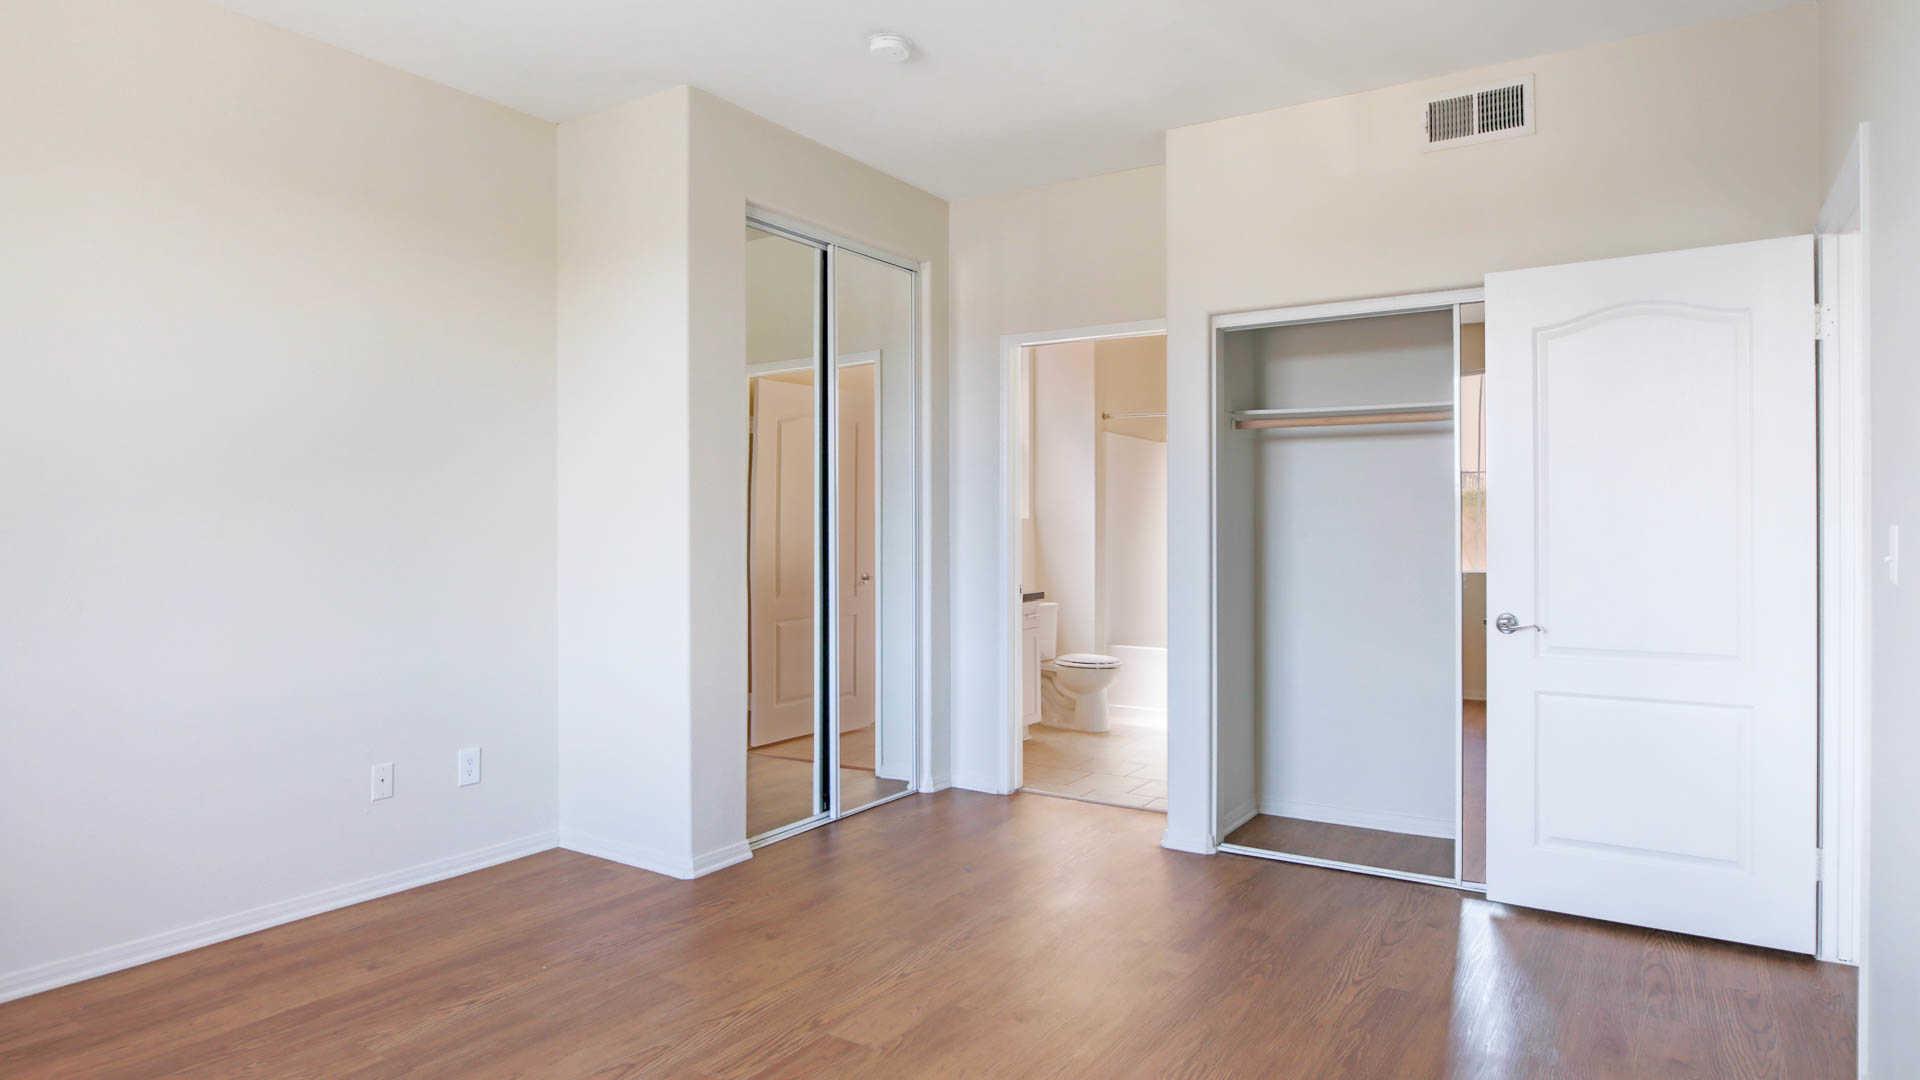 Westside On Beloit Apartments: 2033 Beloit Ave In Brentwood    EquityApartments.com